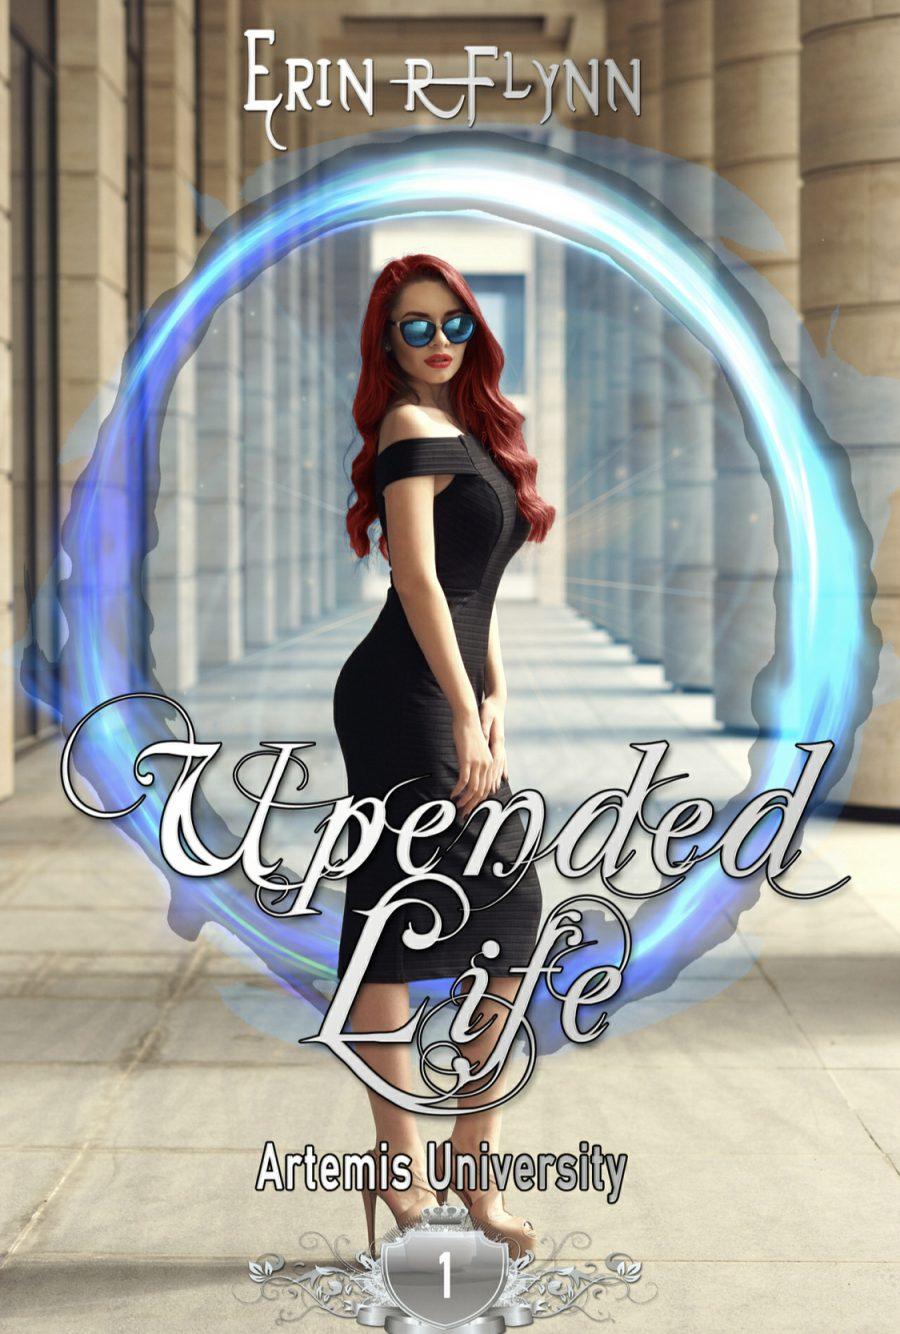 Upended Life (Artemis University - Book 1) by Erin R. Flynn - A Book Review #BookReview #RH #ReverseHarem #Academy #4Stars #AdultUniversity #MediumBurn #KindleUnlimited #KU